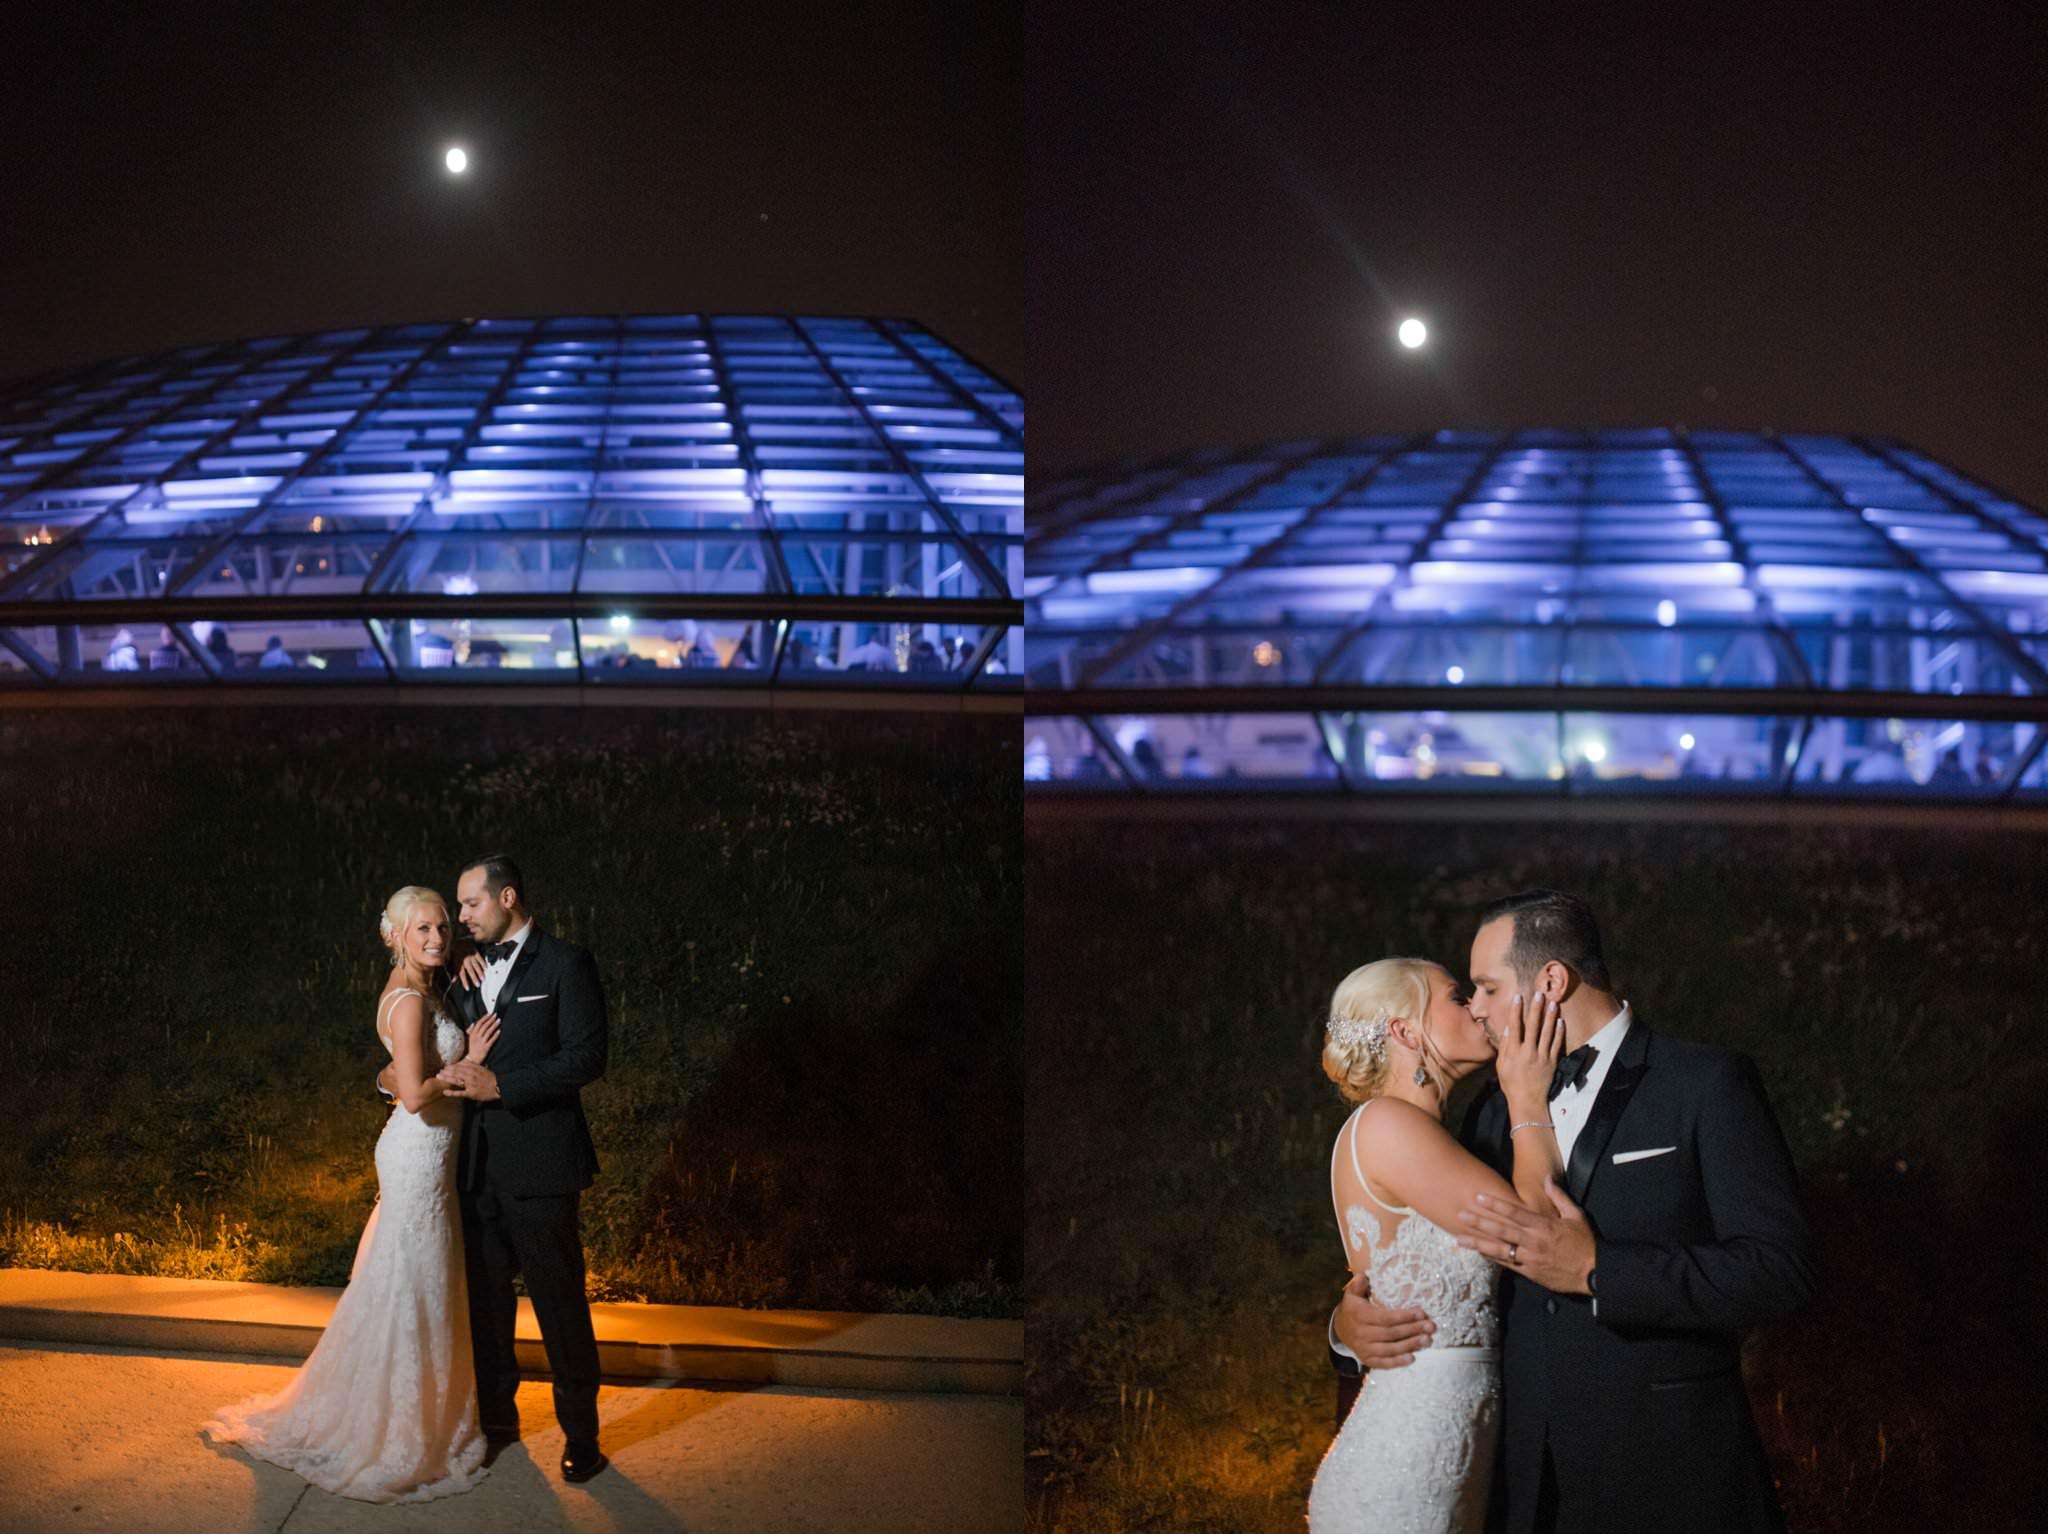 Adler-Planetarium-Chicago-Wedding-Photography-0106.JPG